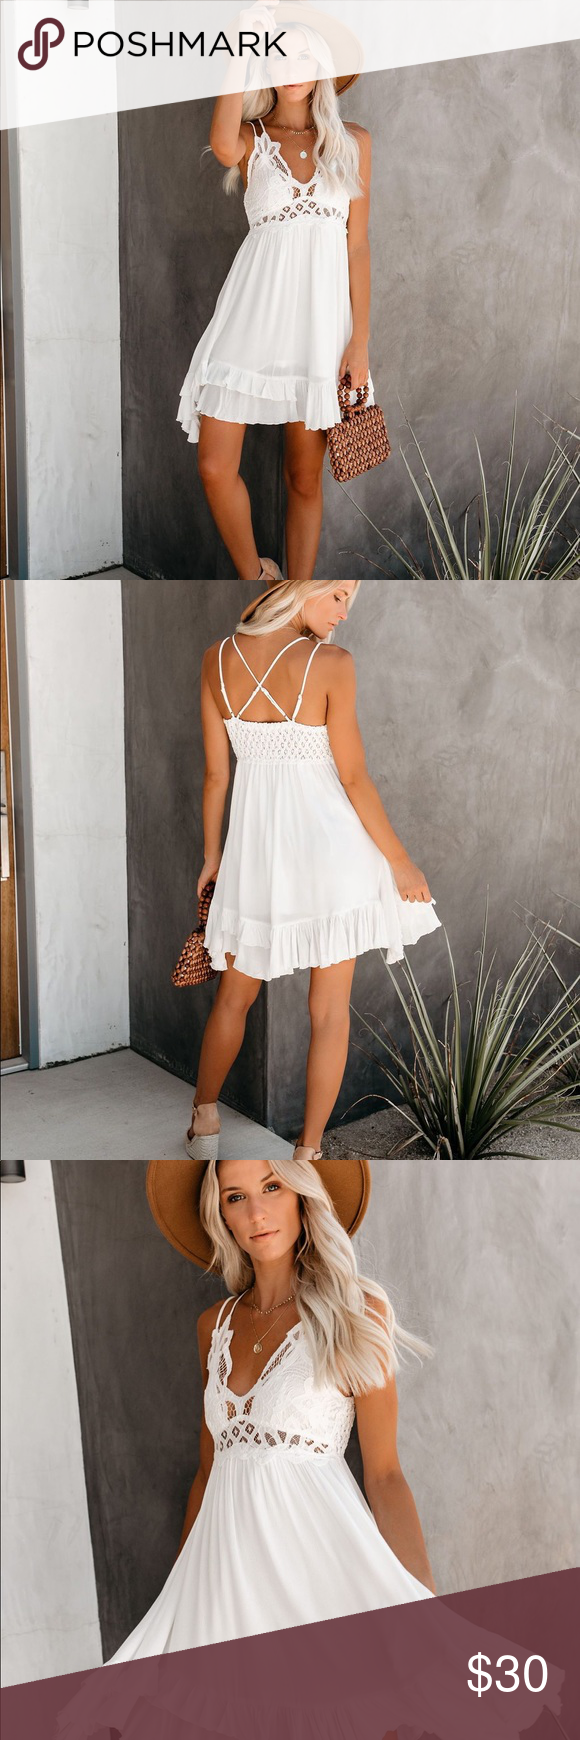 Vici Crochet White Dress Dresses Vici Dress White Crochet [ 1740 x 580 Pixel ]